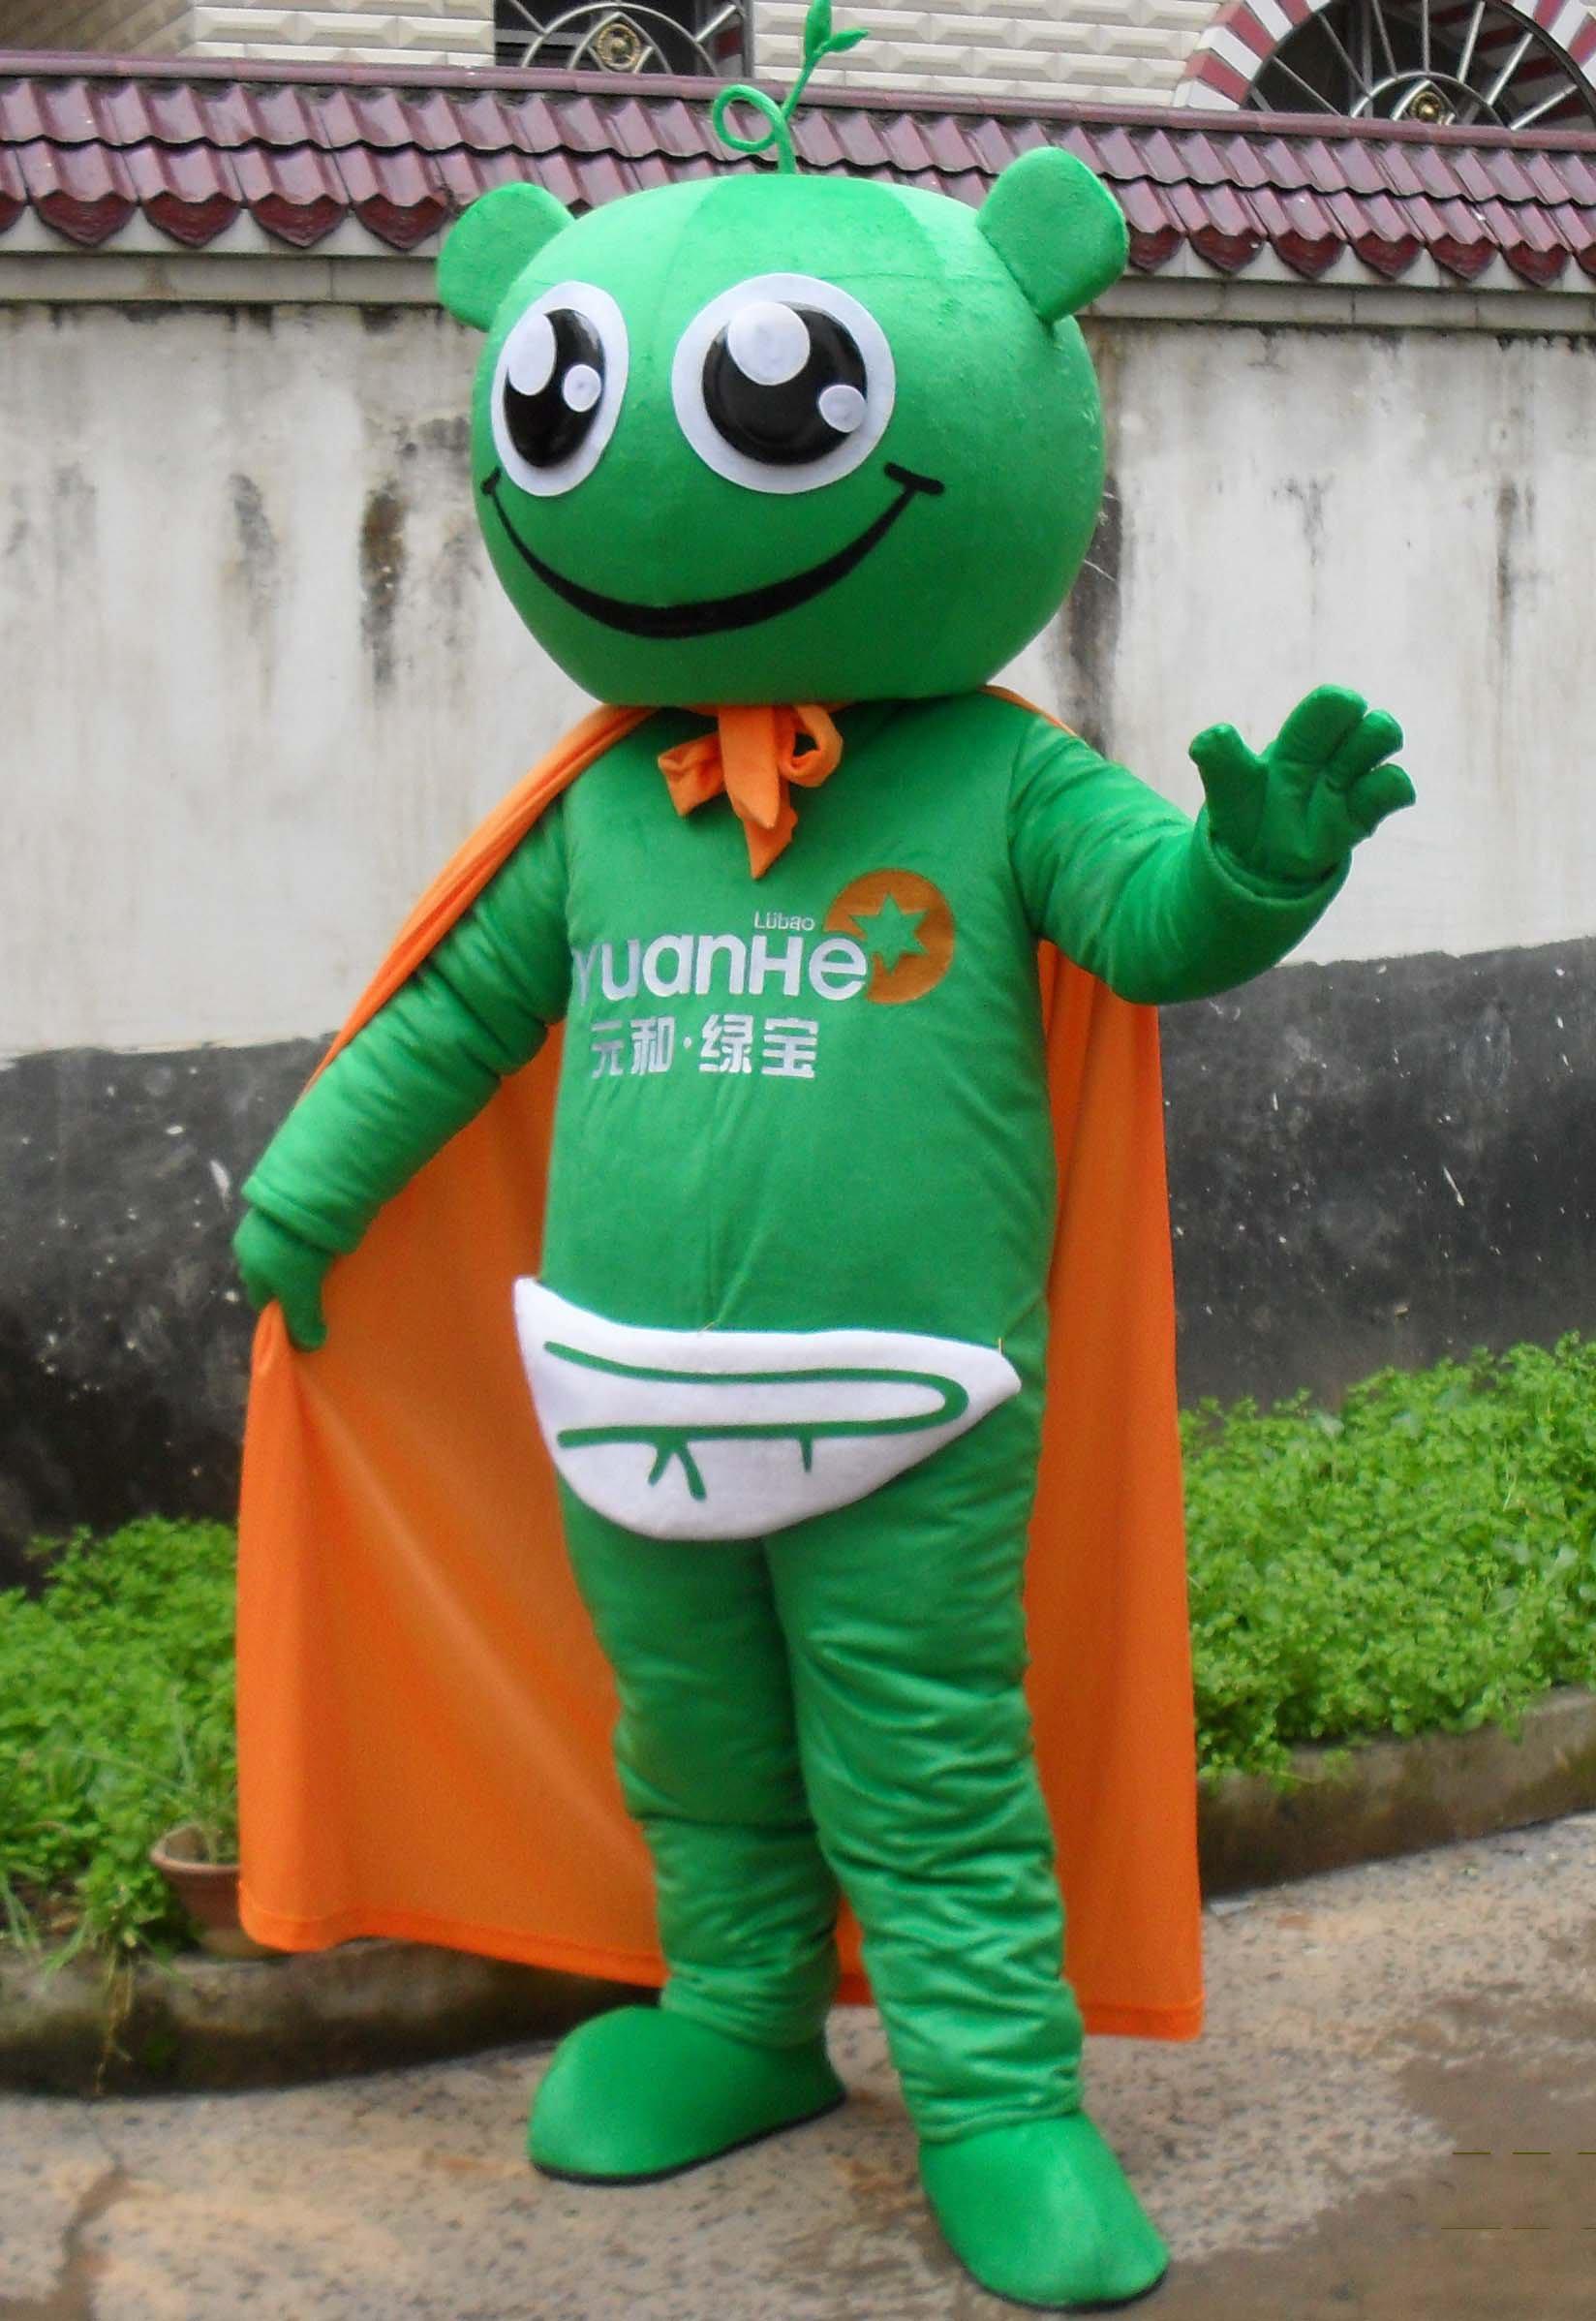 Lucky Cartoon Doll Clothing Cartoon Walking Doll Clothing Cartoon Show Clothing Emerald Advertising Mascot Costume